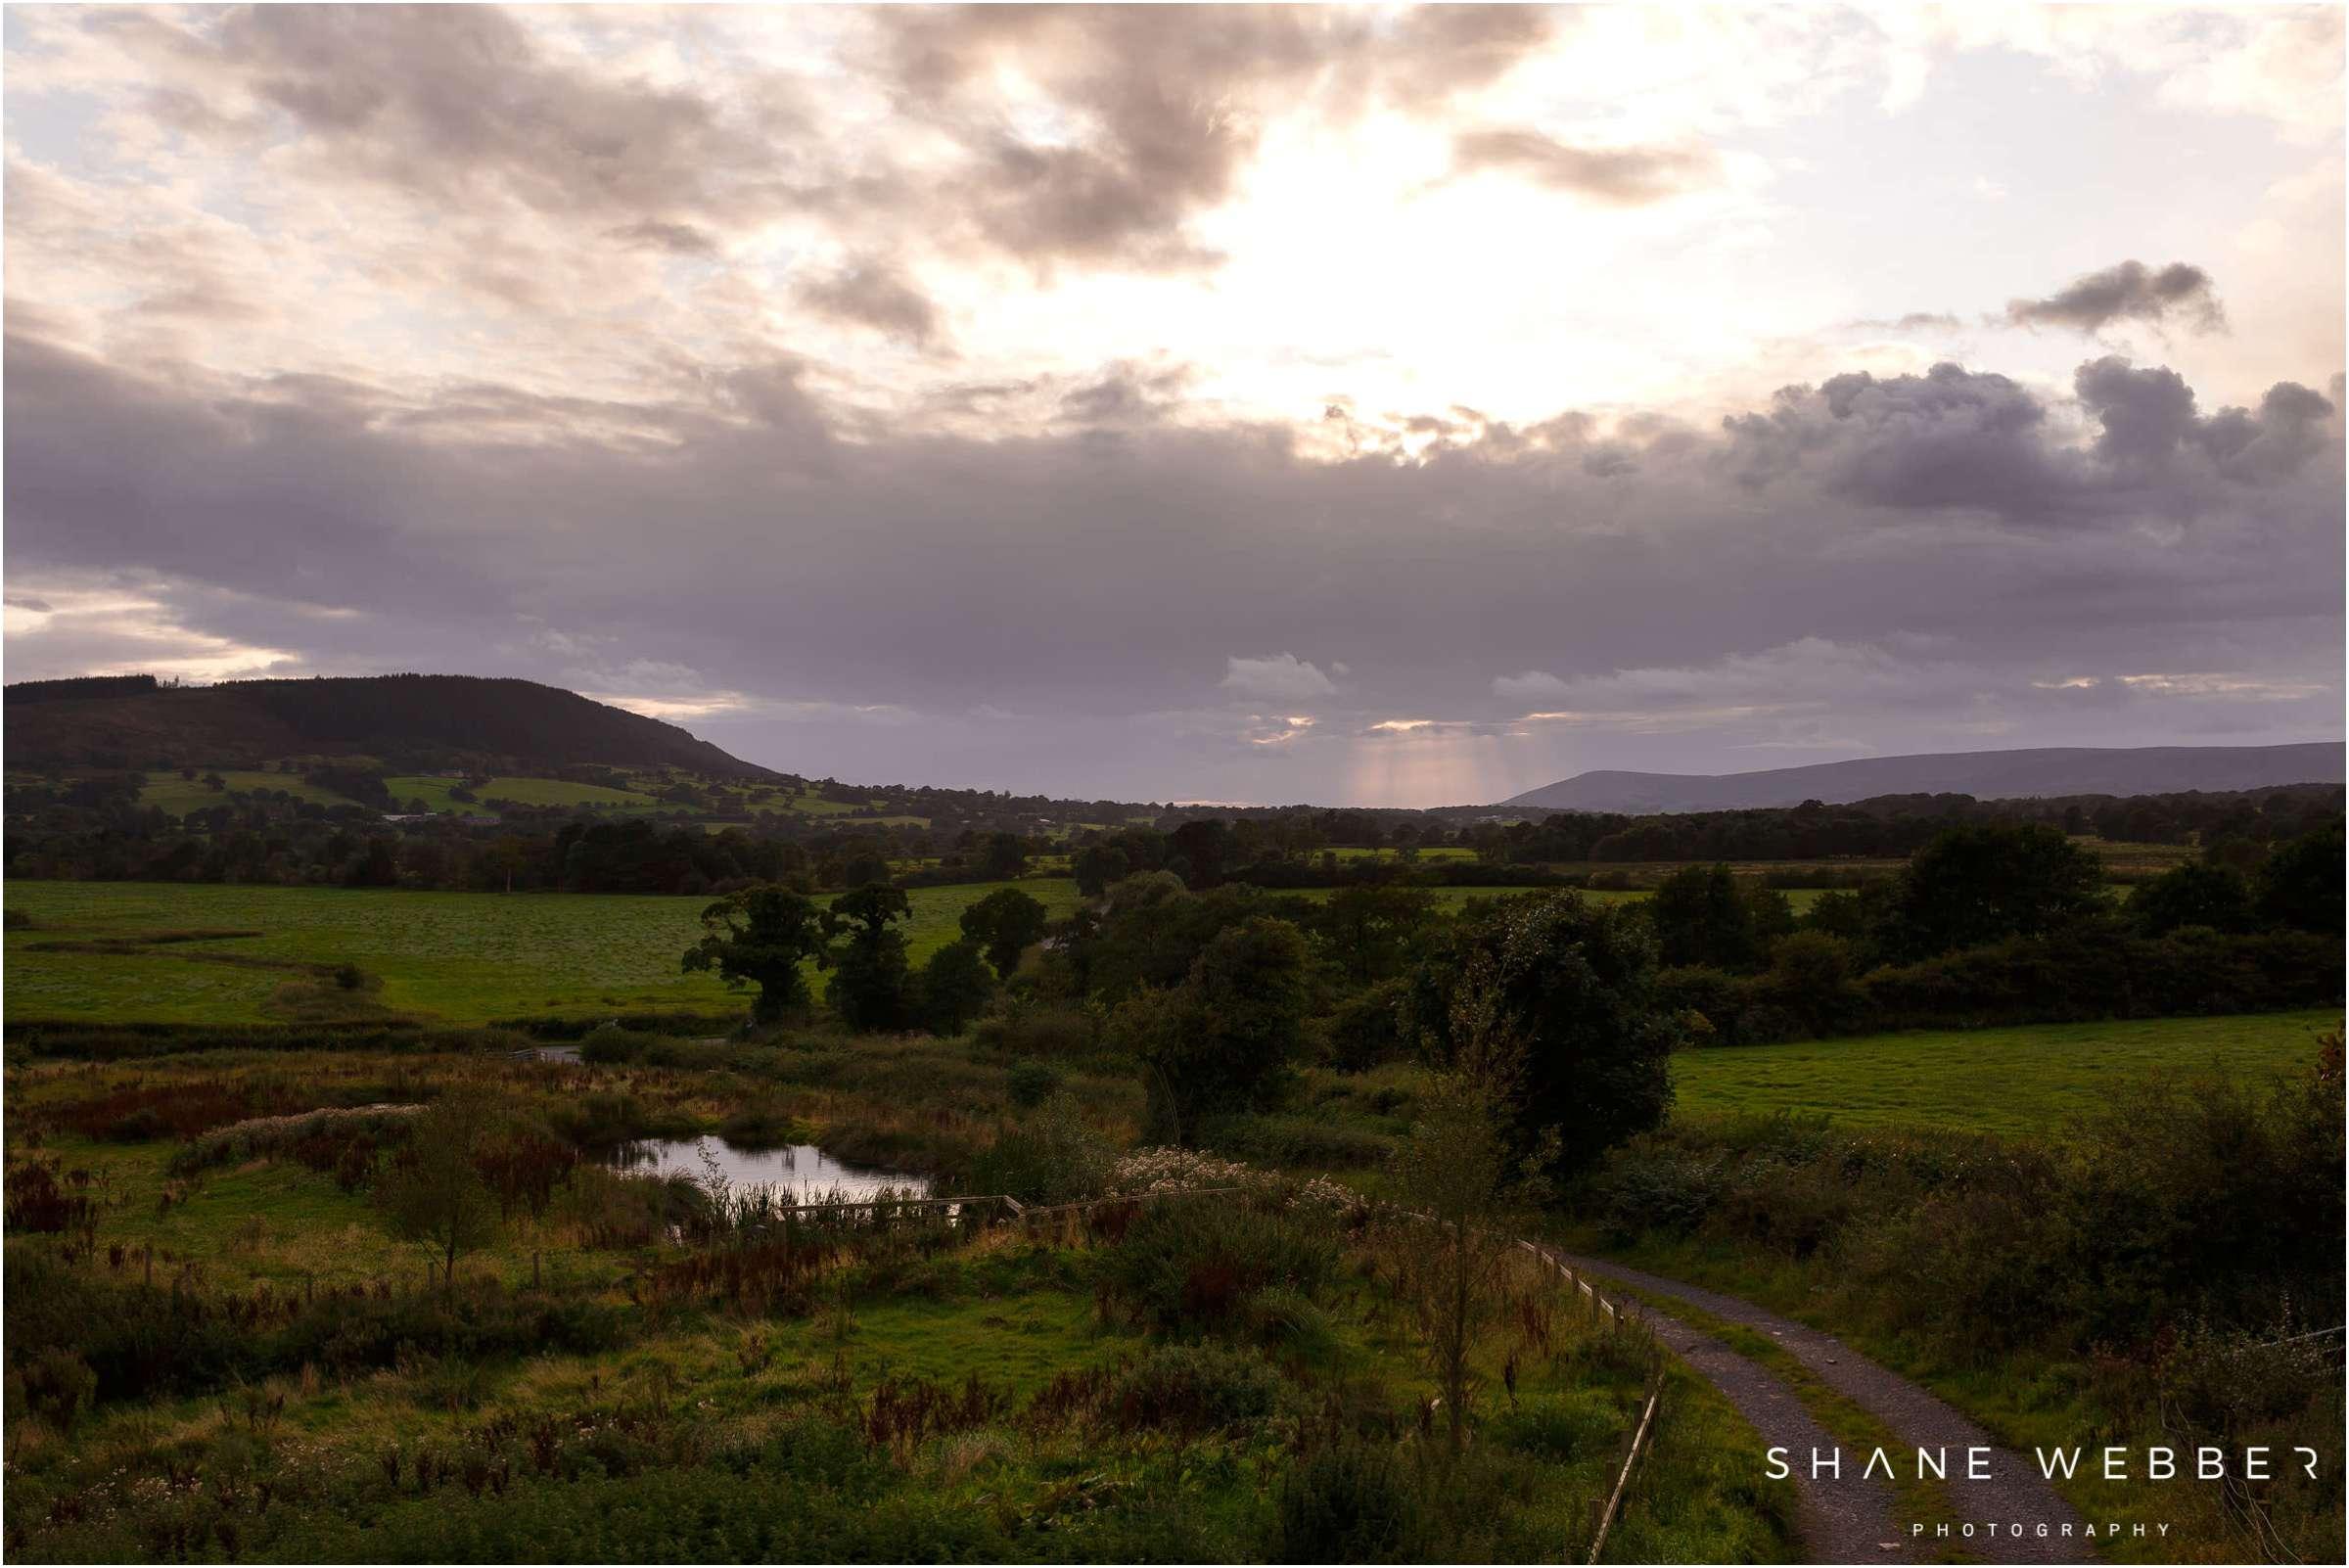 lancashire views